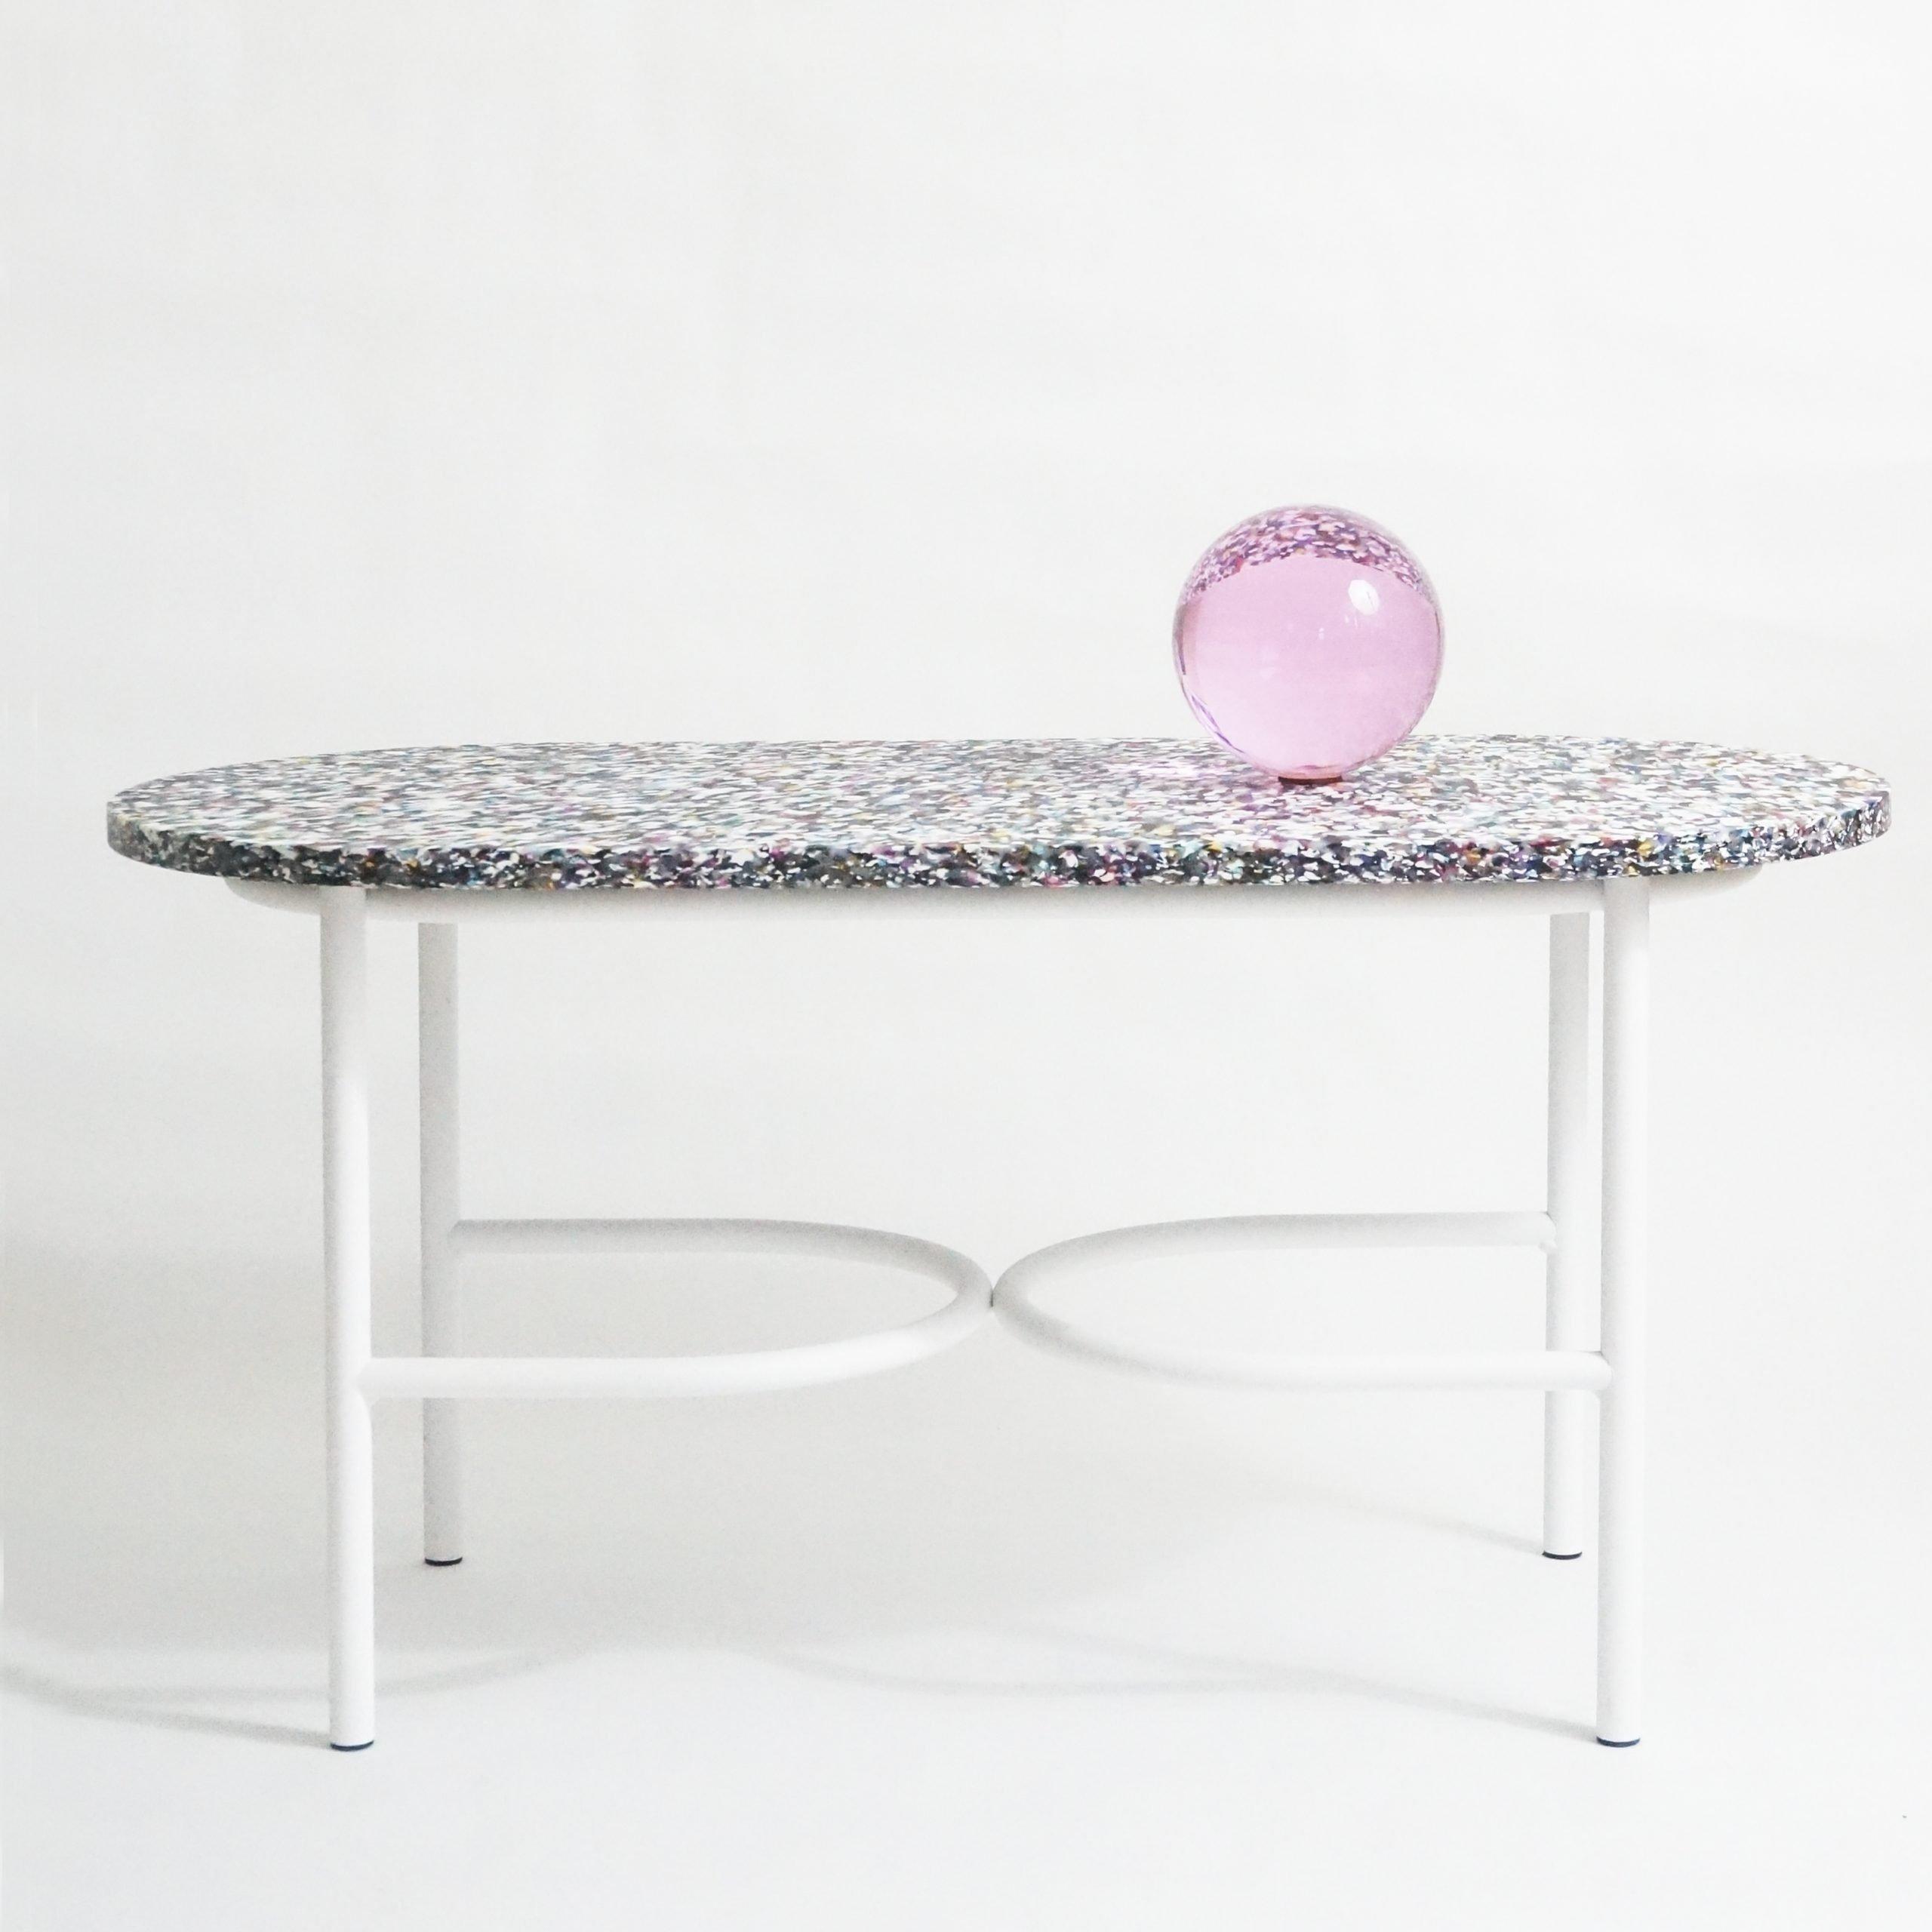 Notebook Sofa Table by Swedish Ninja. Material: Kaleido.